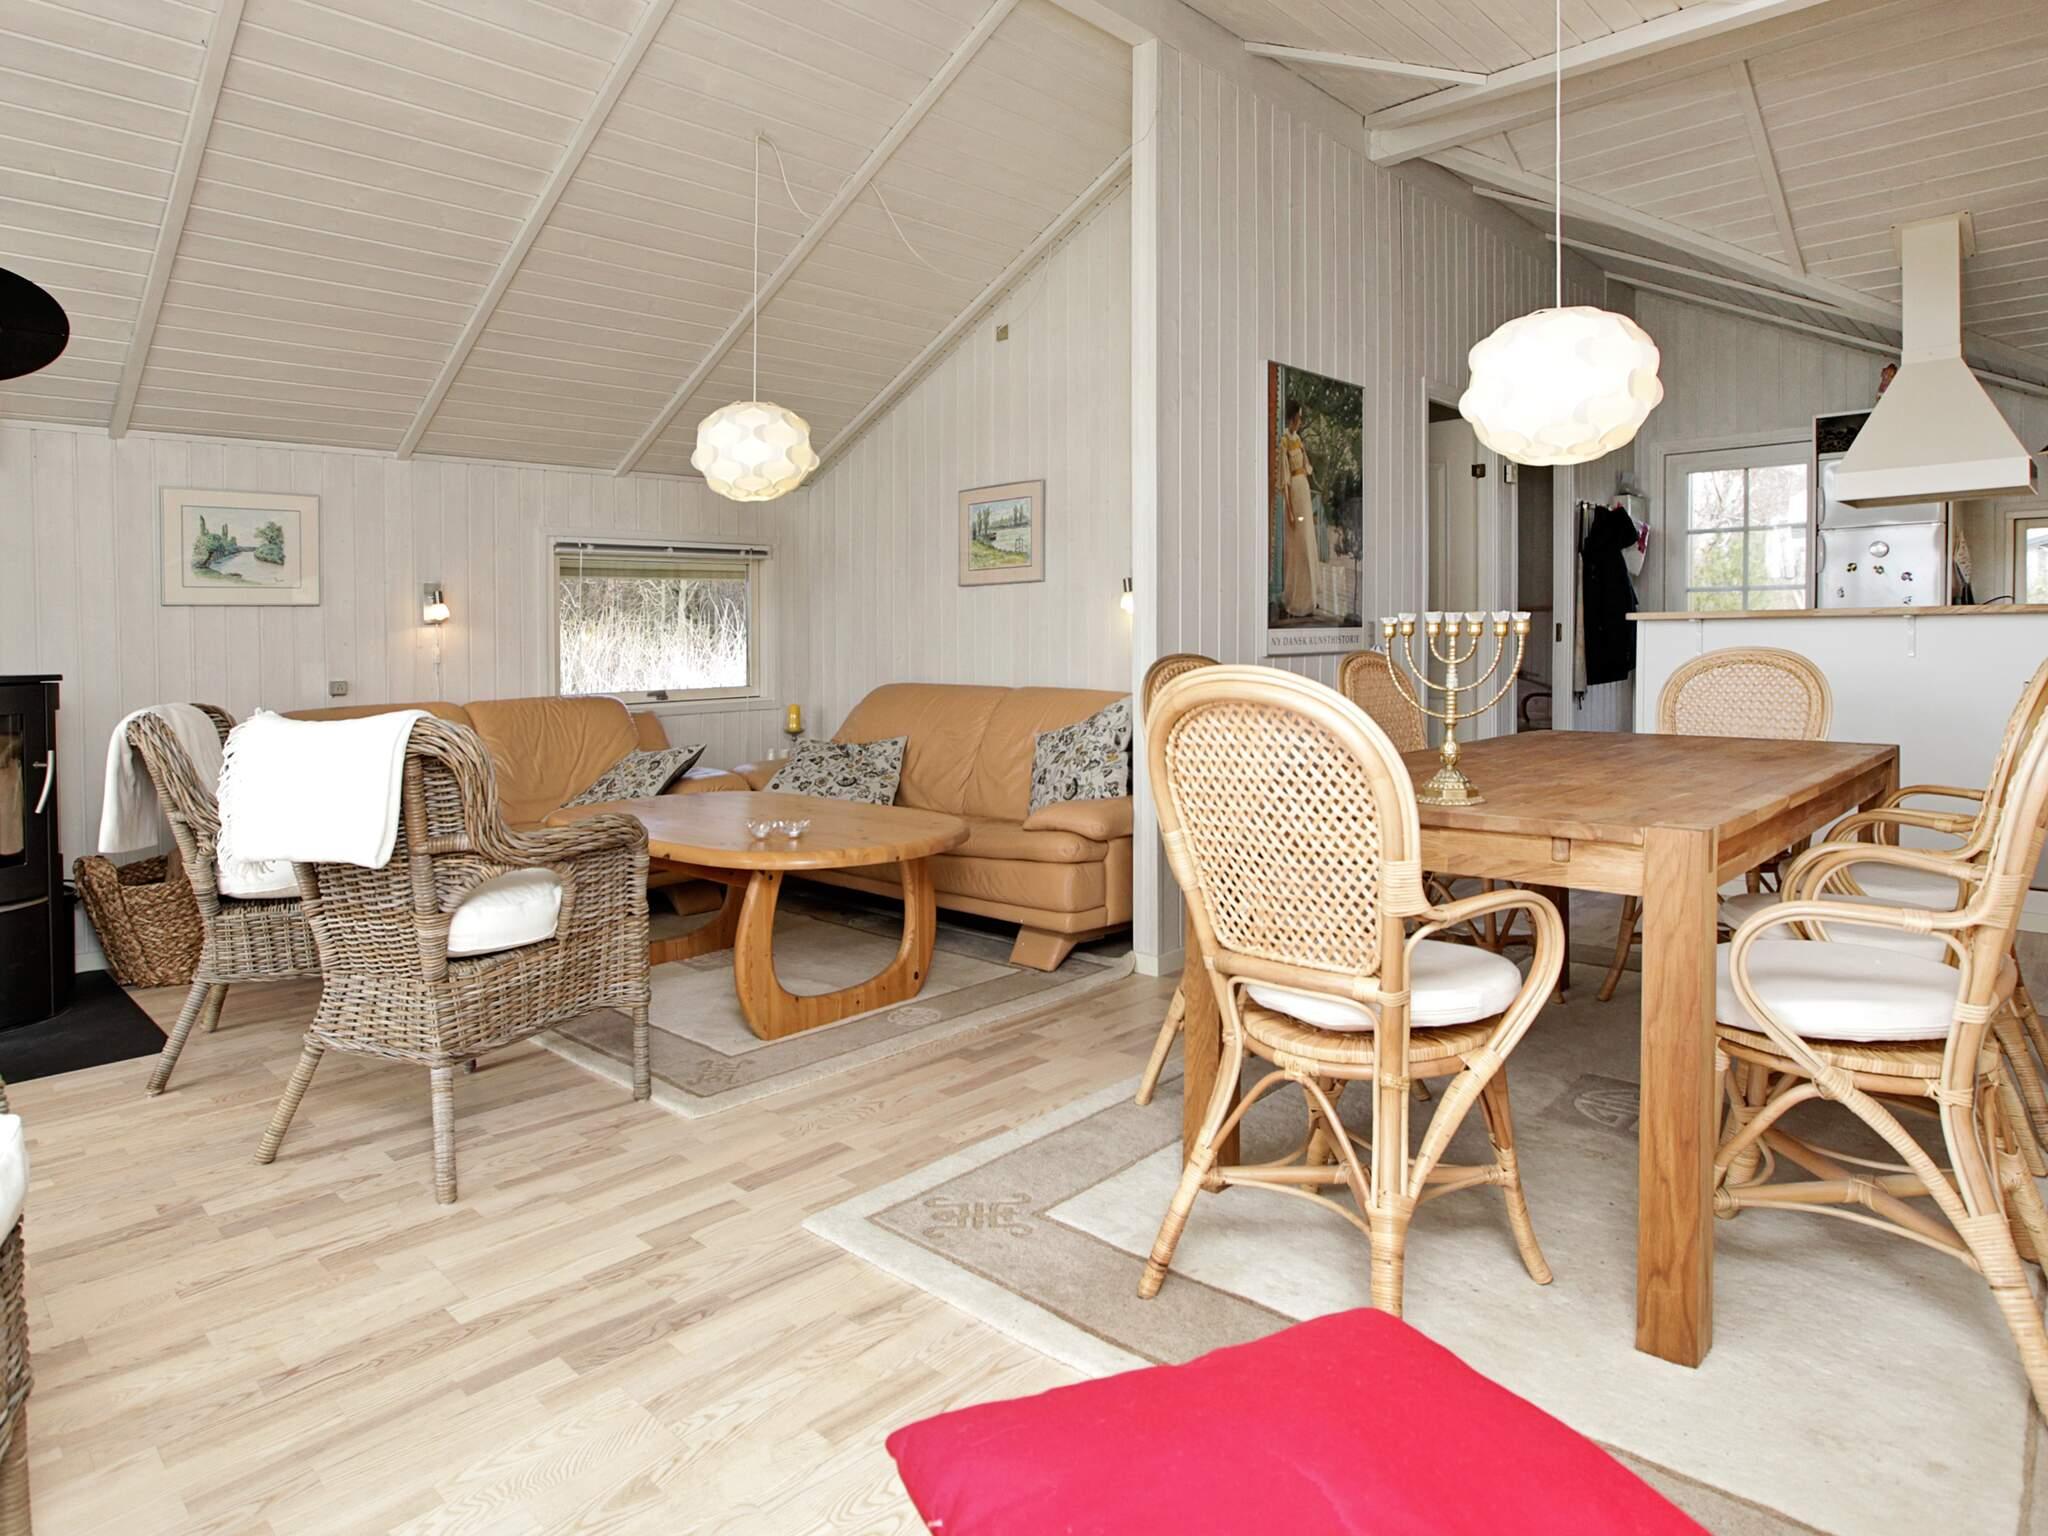 Ferienhaus Råbylille Strand (87316), Råbylille, , Møn, Dänemark, Bild 7